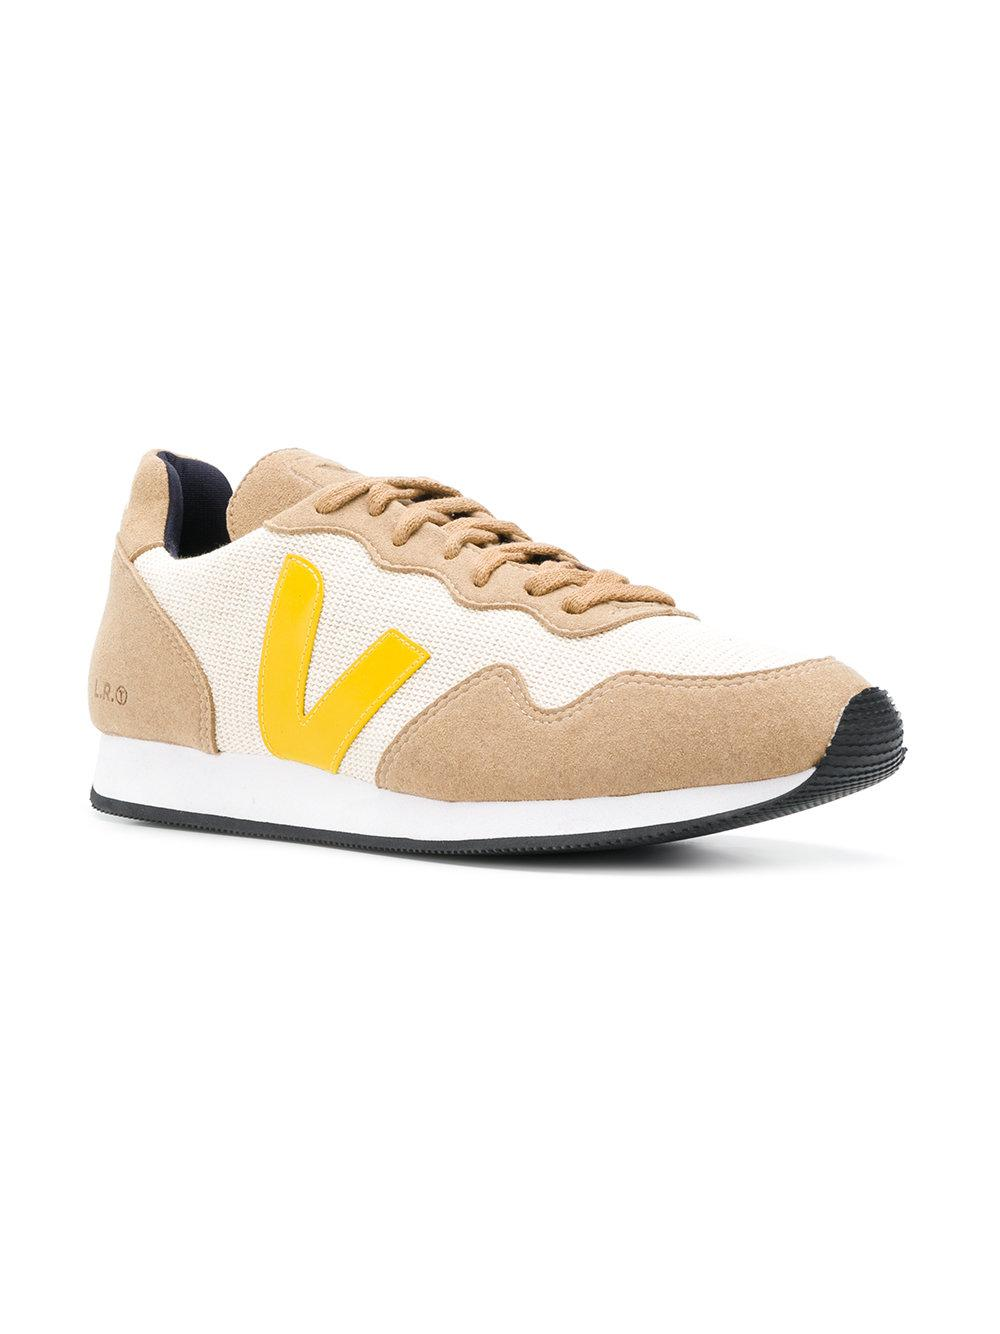 SDU sneakers - Nude & Neutrals Veja nUyMRXoB